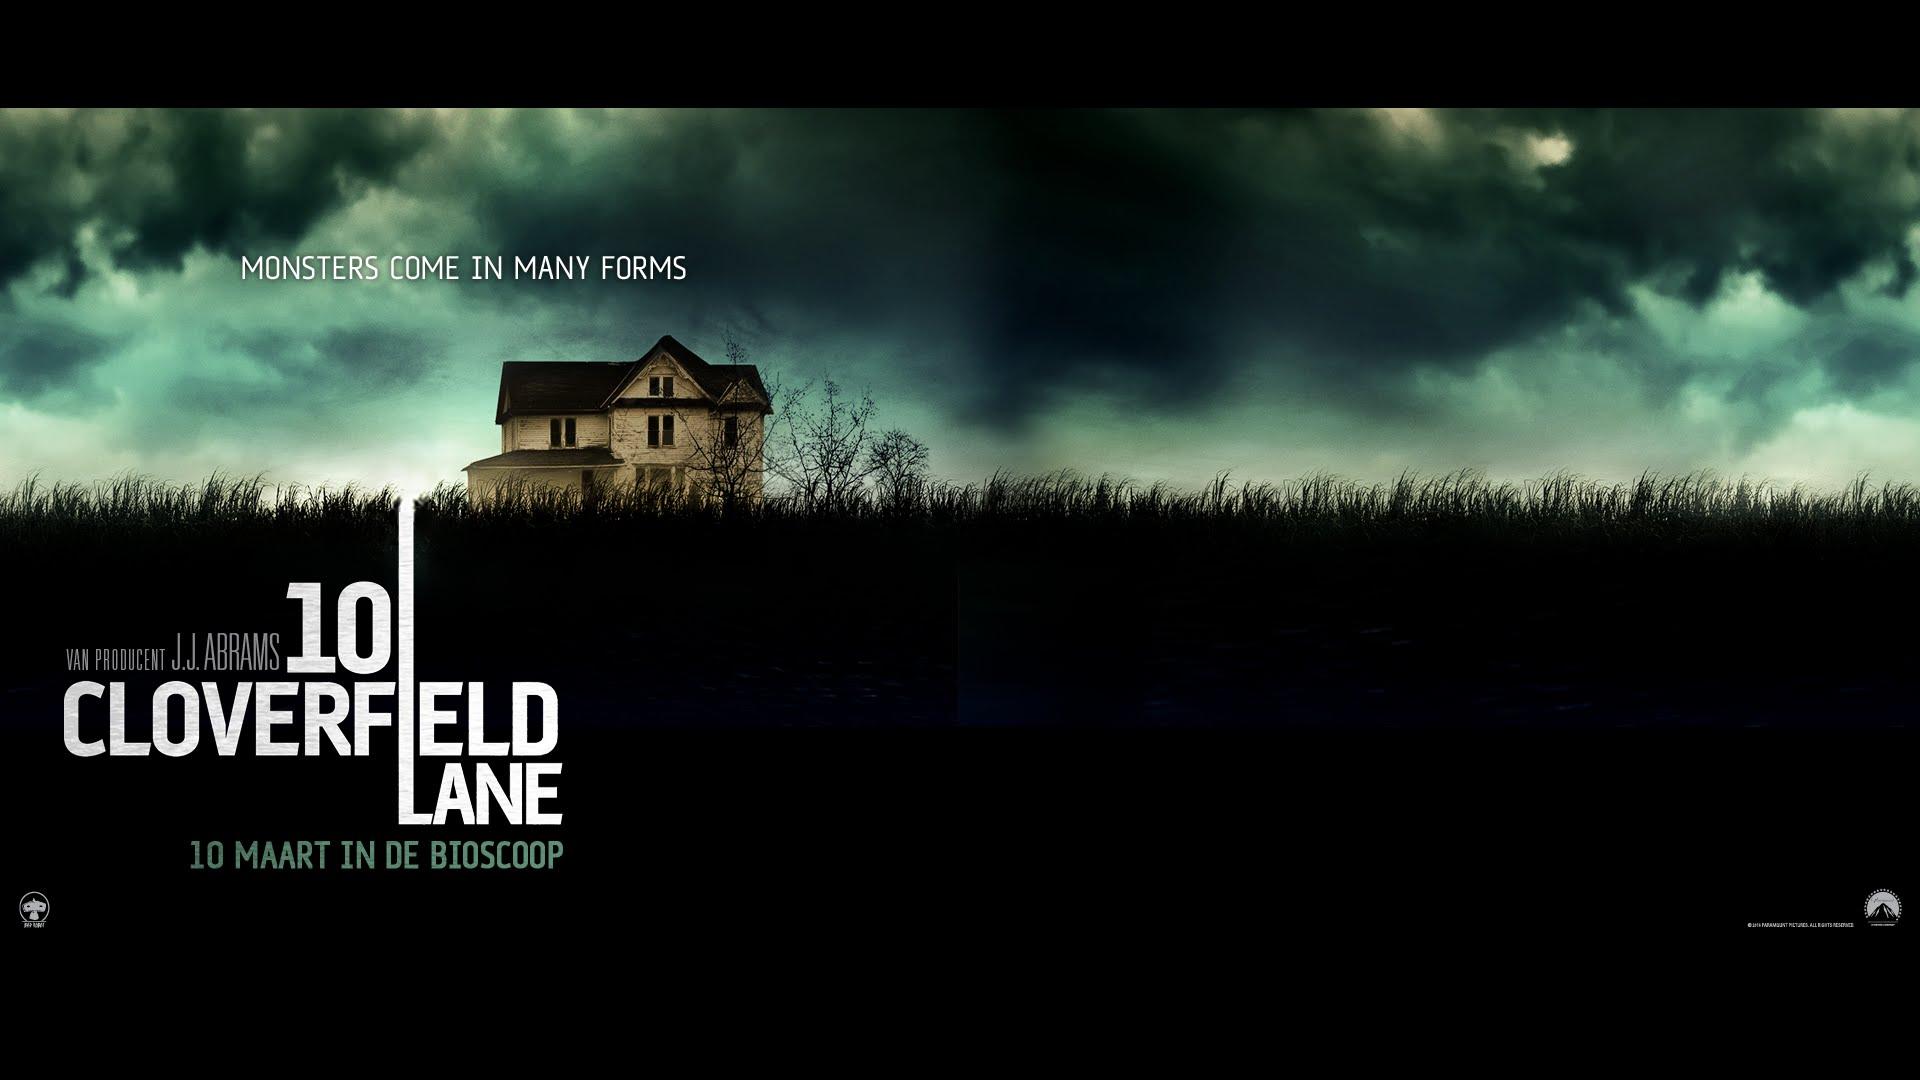 10 Cloverfield Lane Taut Suspense Psychological Horror America Haunted